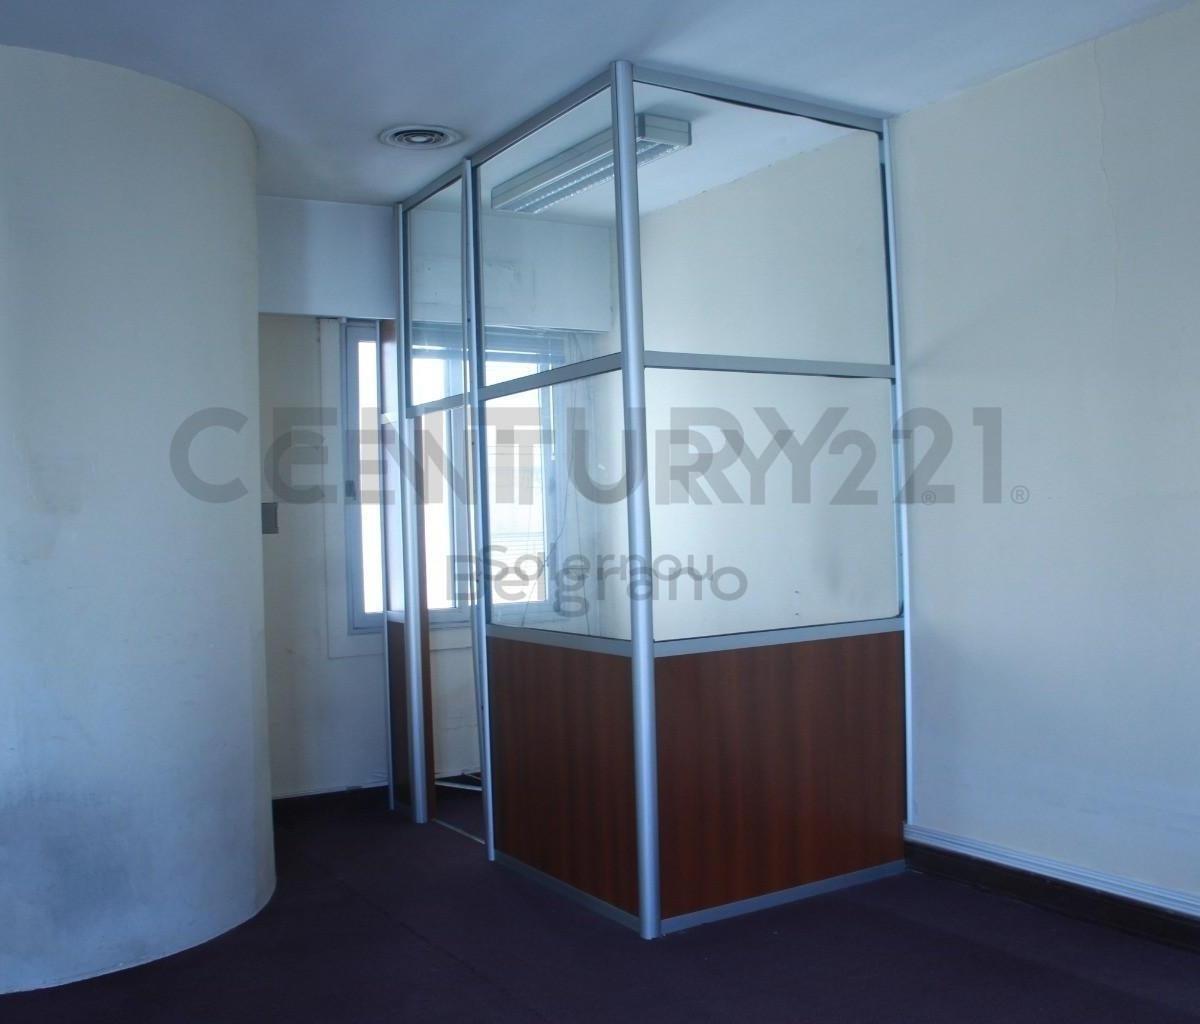 venta de oficinas en congreso av. callao al 500, 220mts2. financiación privada.